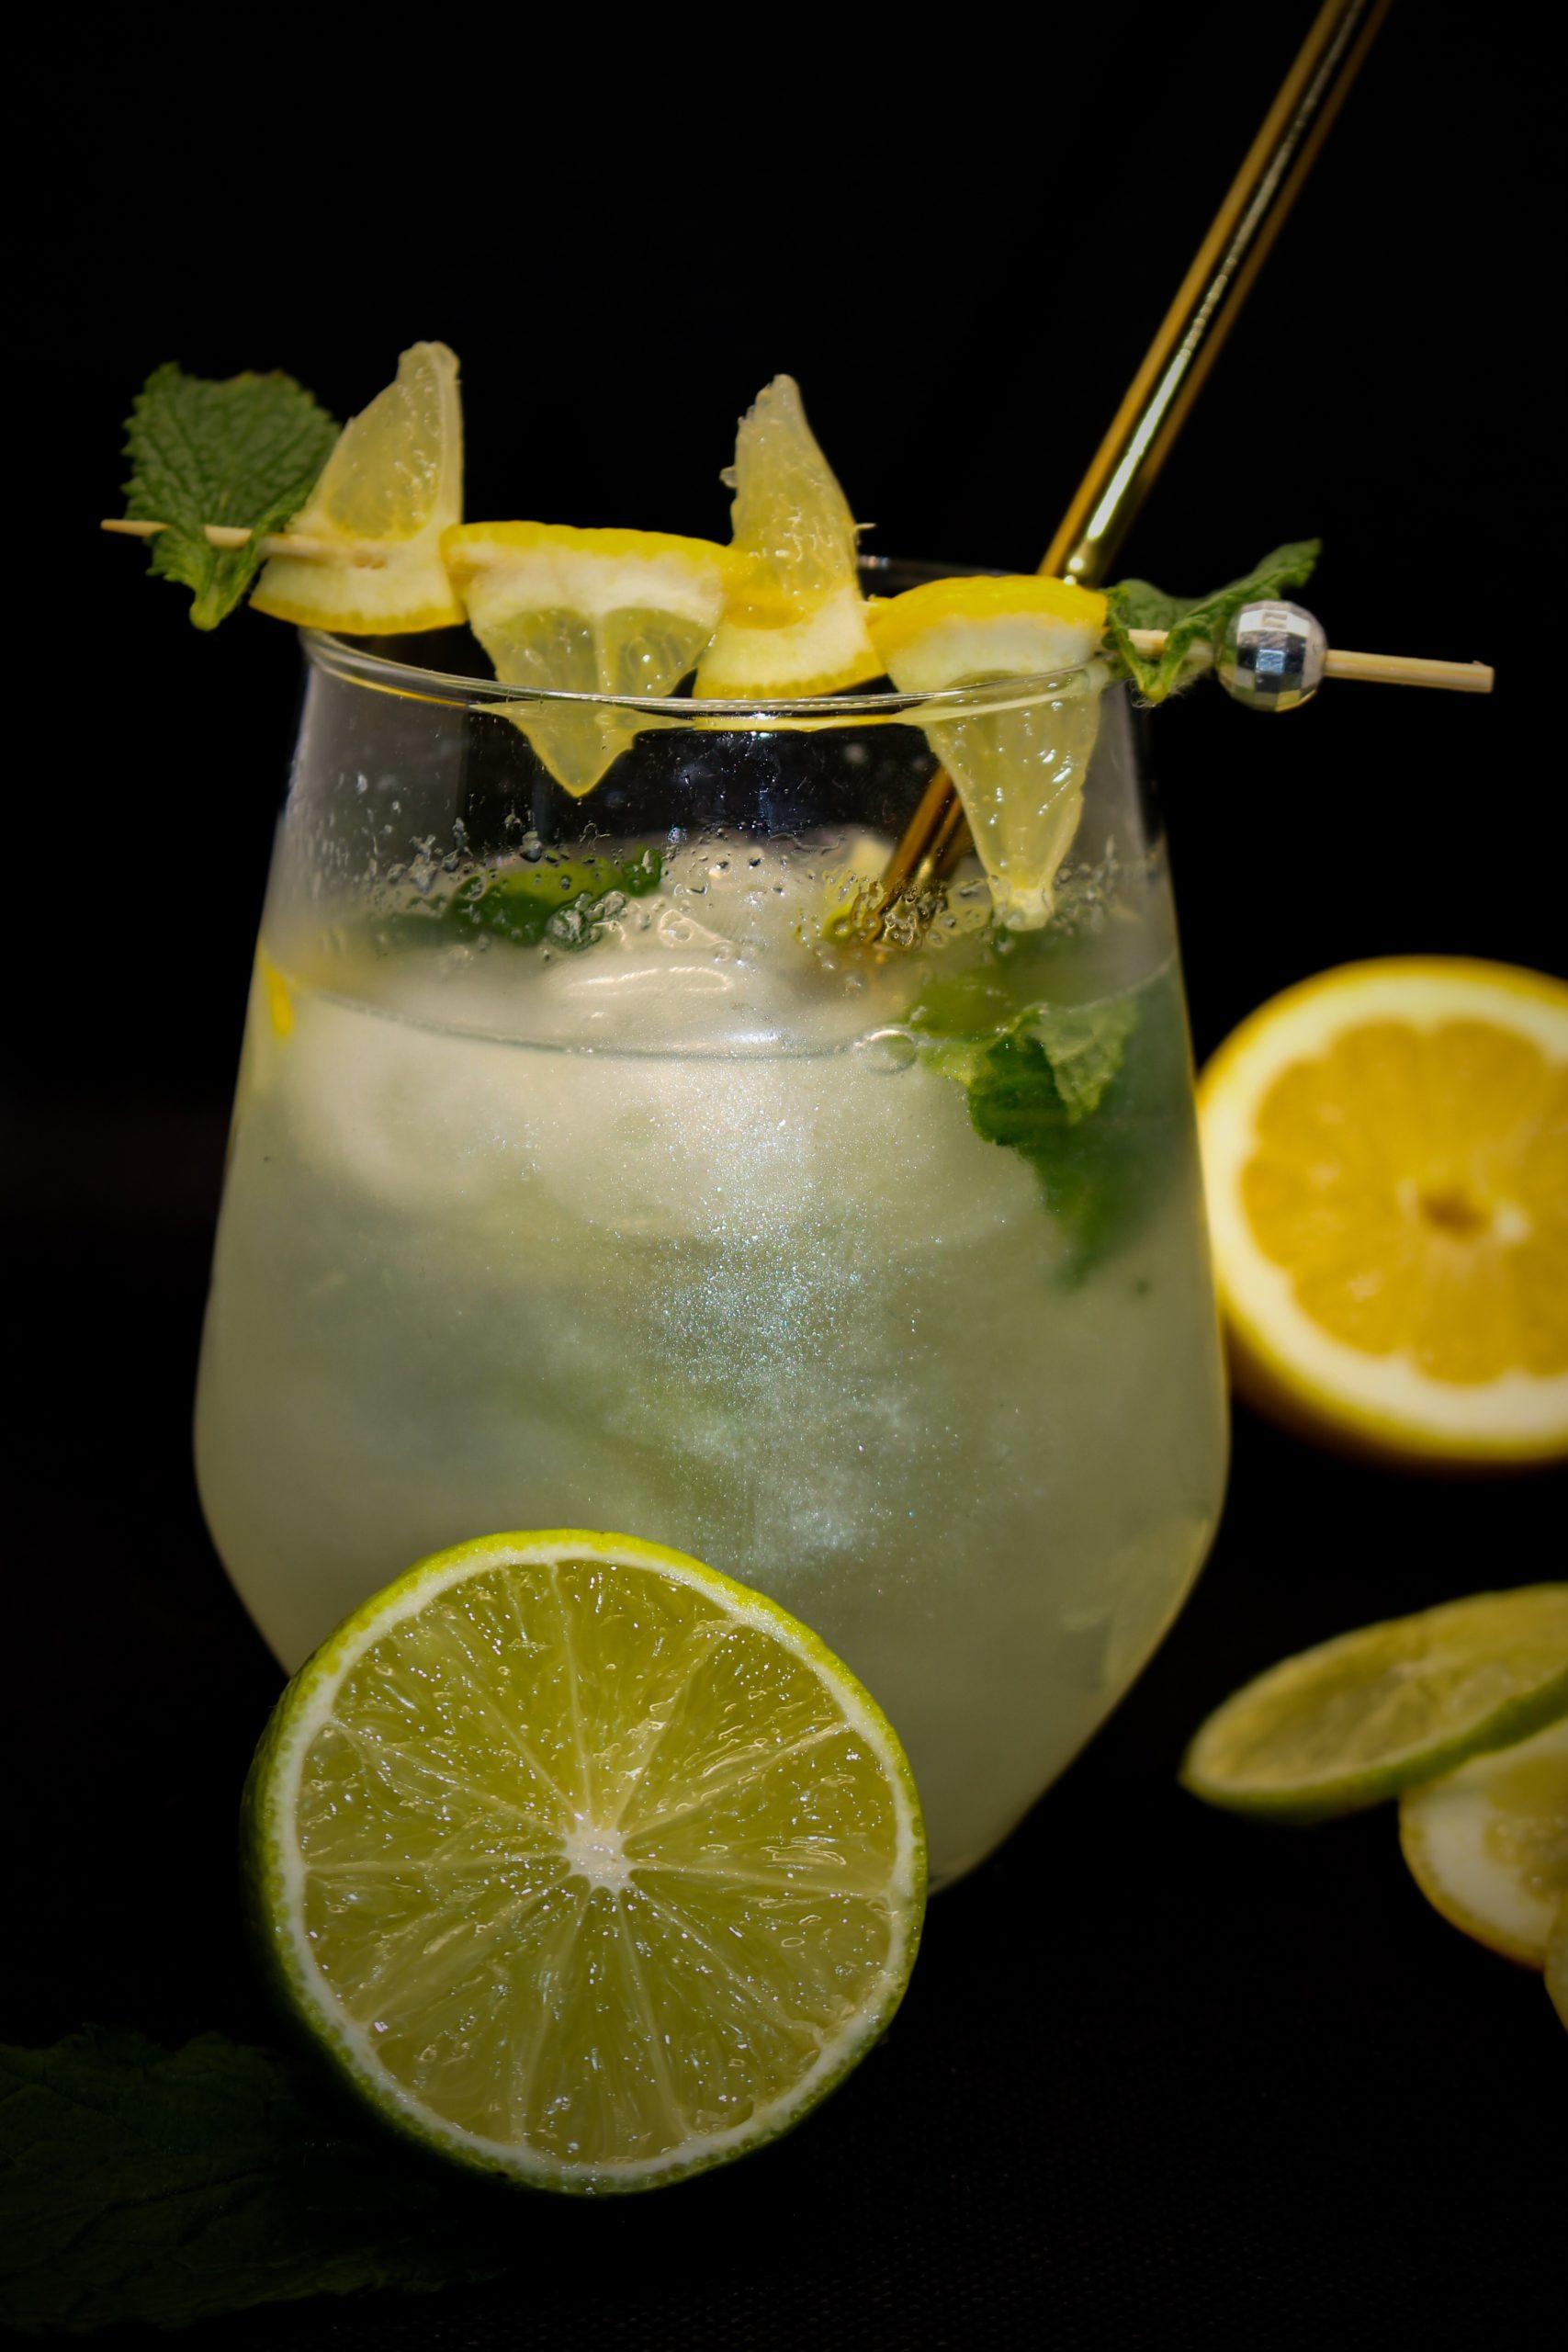 https://www.mirelys.eu/wp-content/uploads/2021/06/vodka-mojito-scintillant-mirelys-cocktail-scaled.jpg